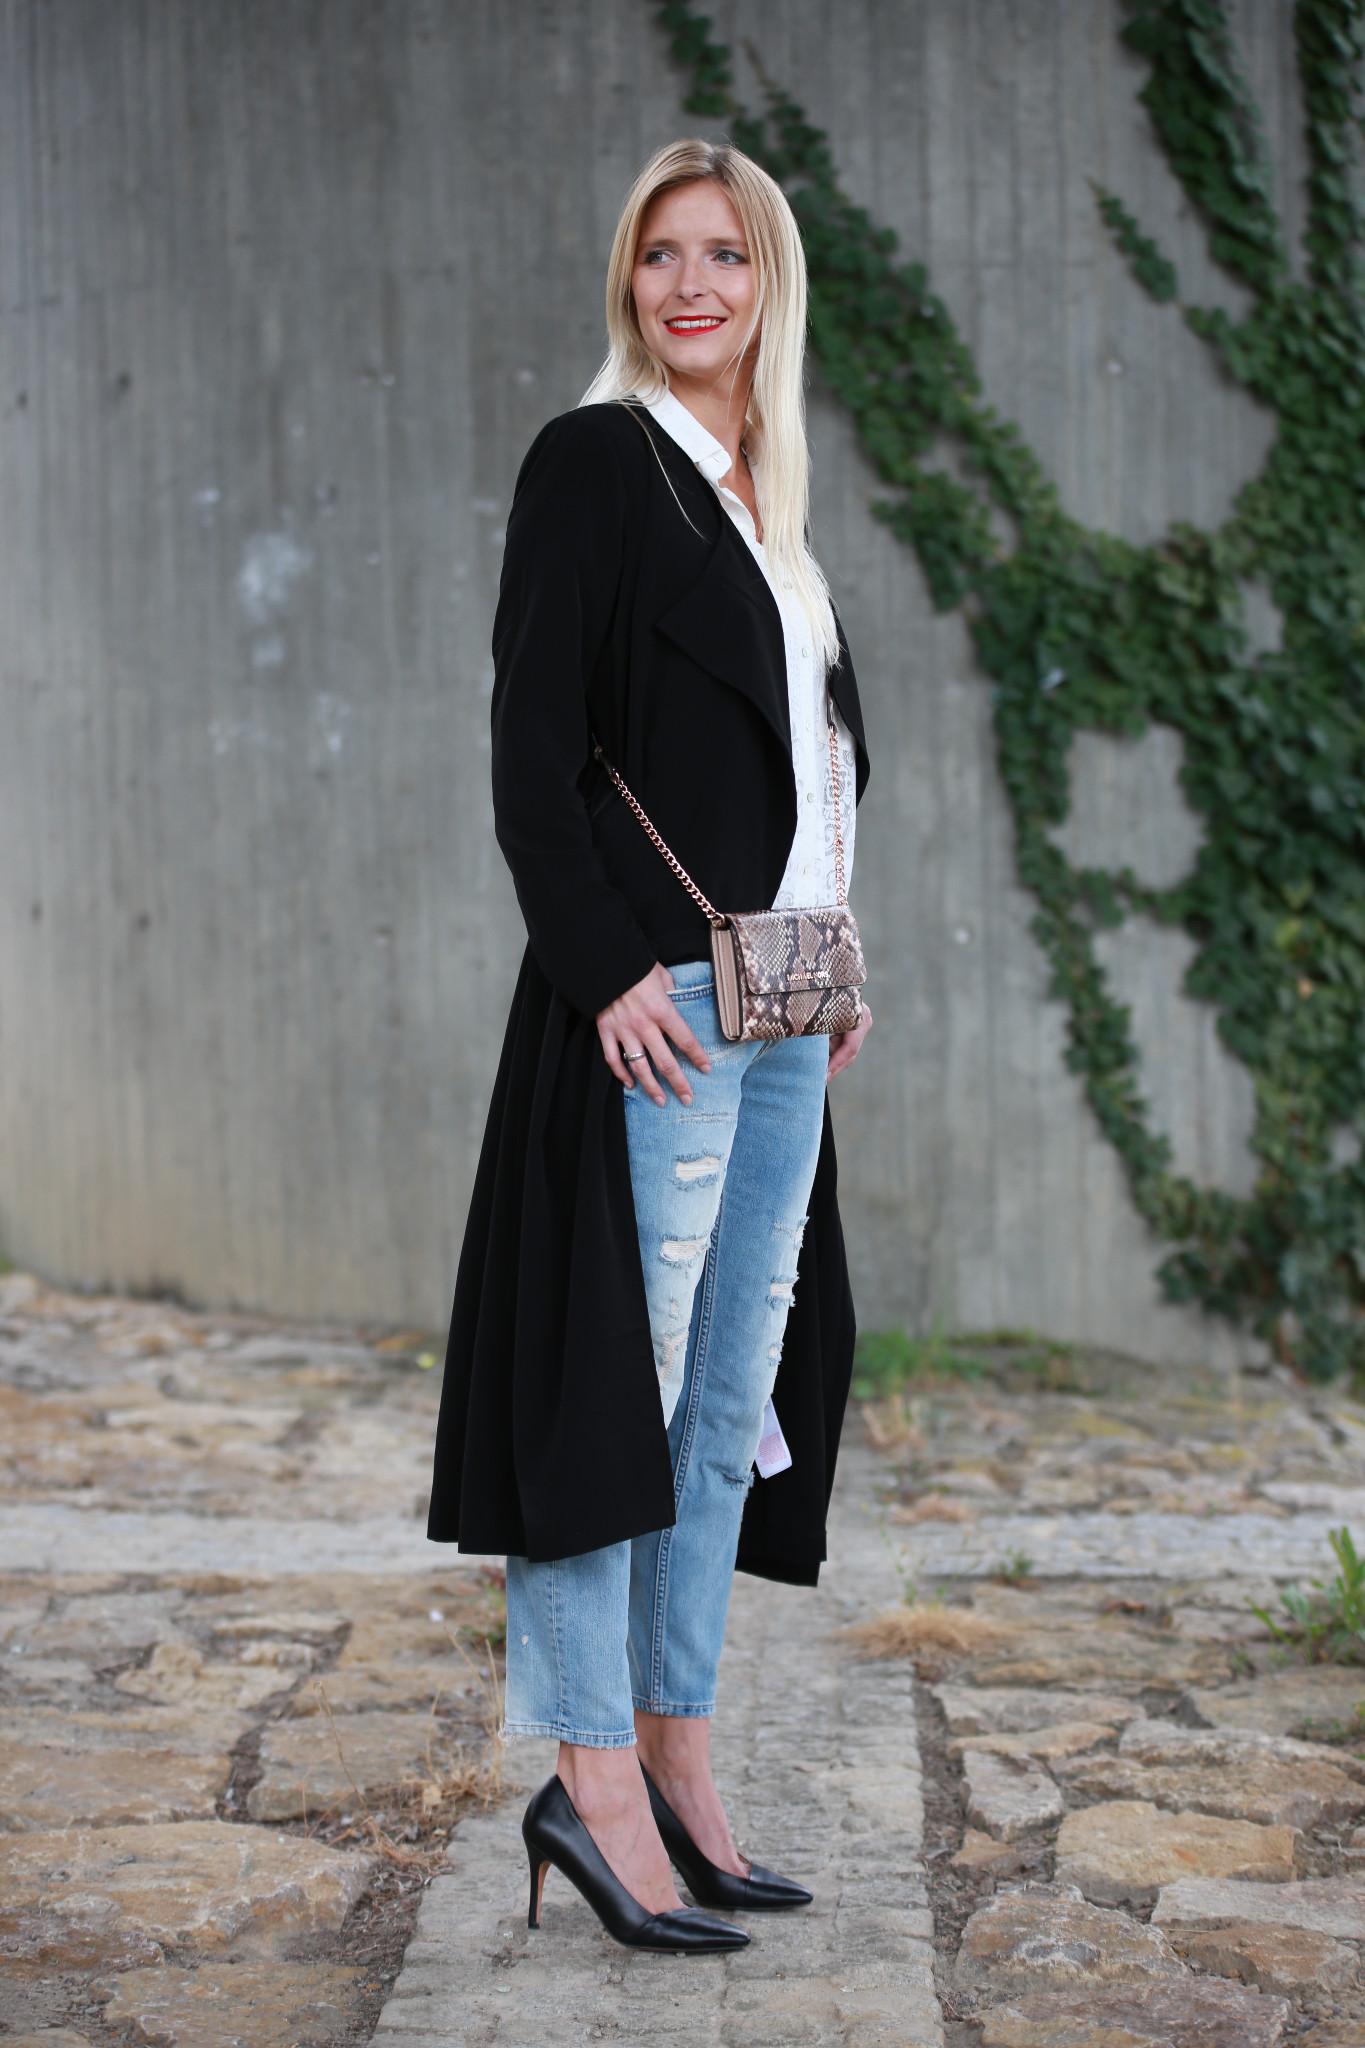 Fashion_Outfit_Michael_Kors_Jet_Set_6